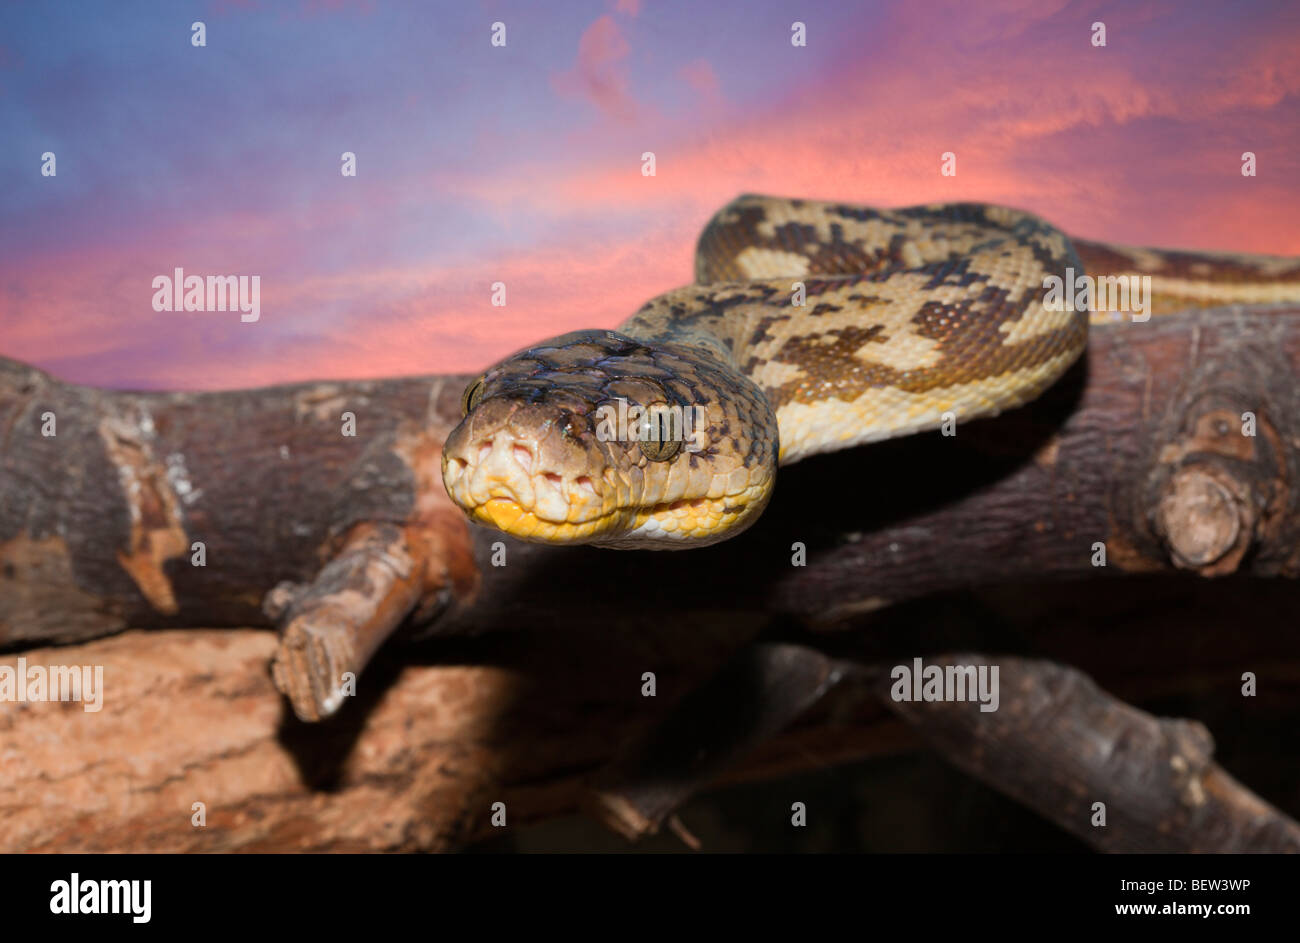 Timor Python, Python timoriensis, Timor, Lesser Sunda Islands, Indonesia - Stock Image